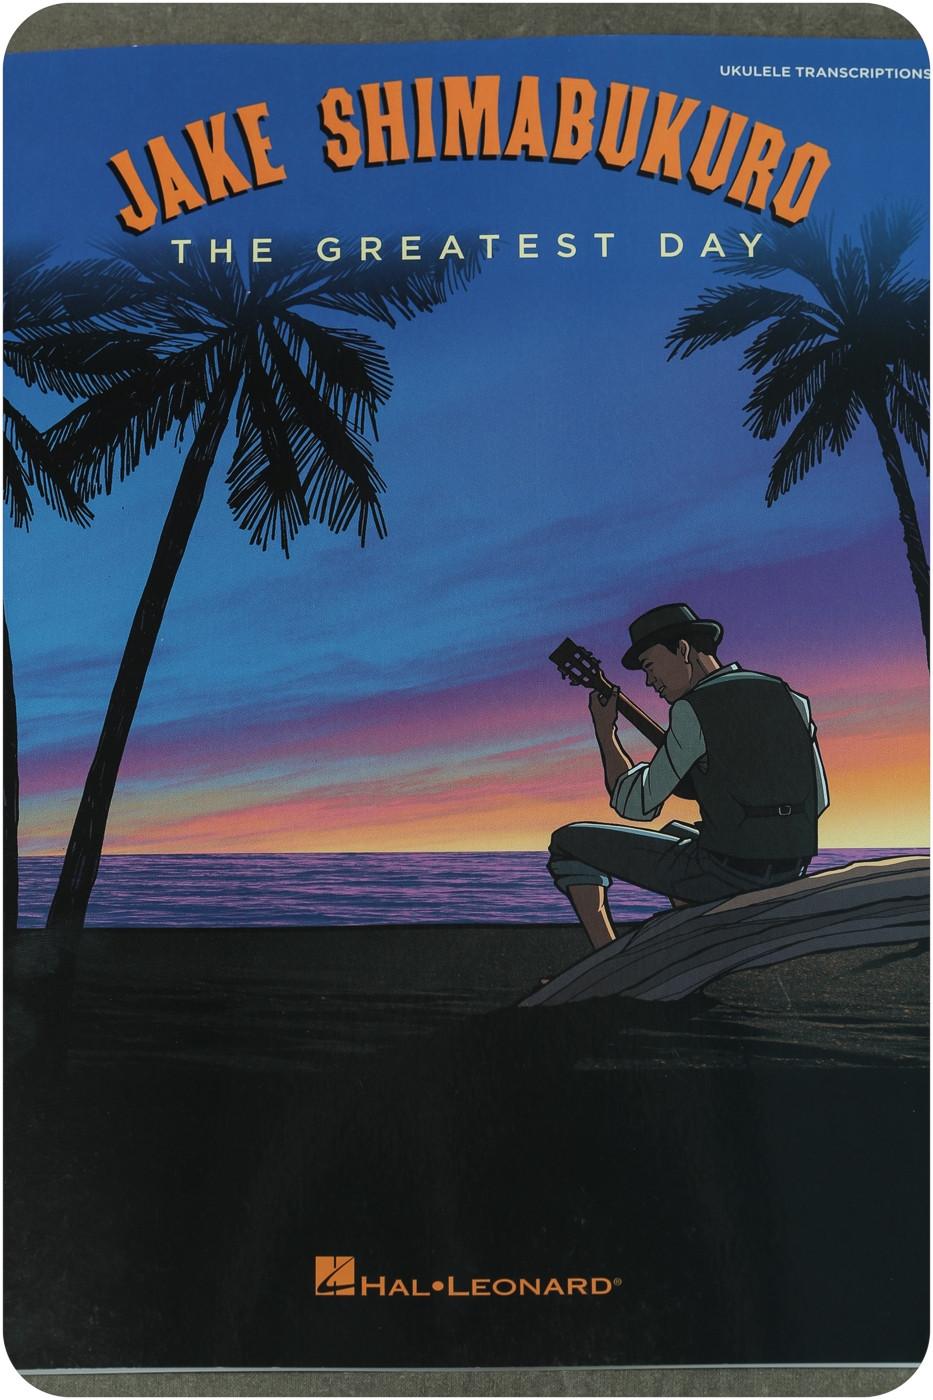 Jake Shimabukuro – The Greatest Day